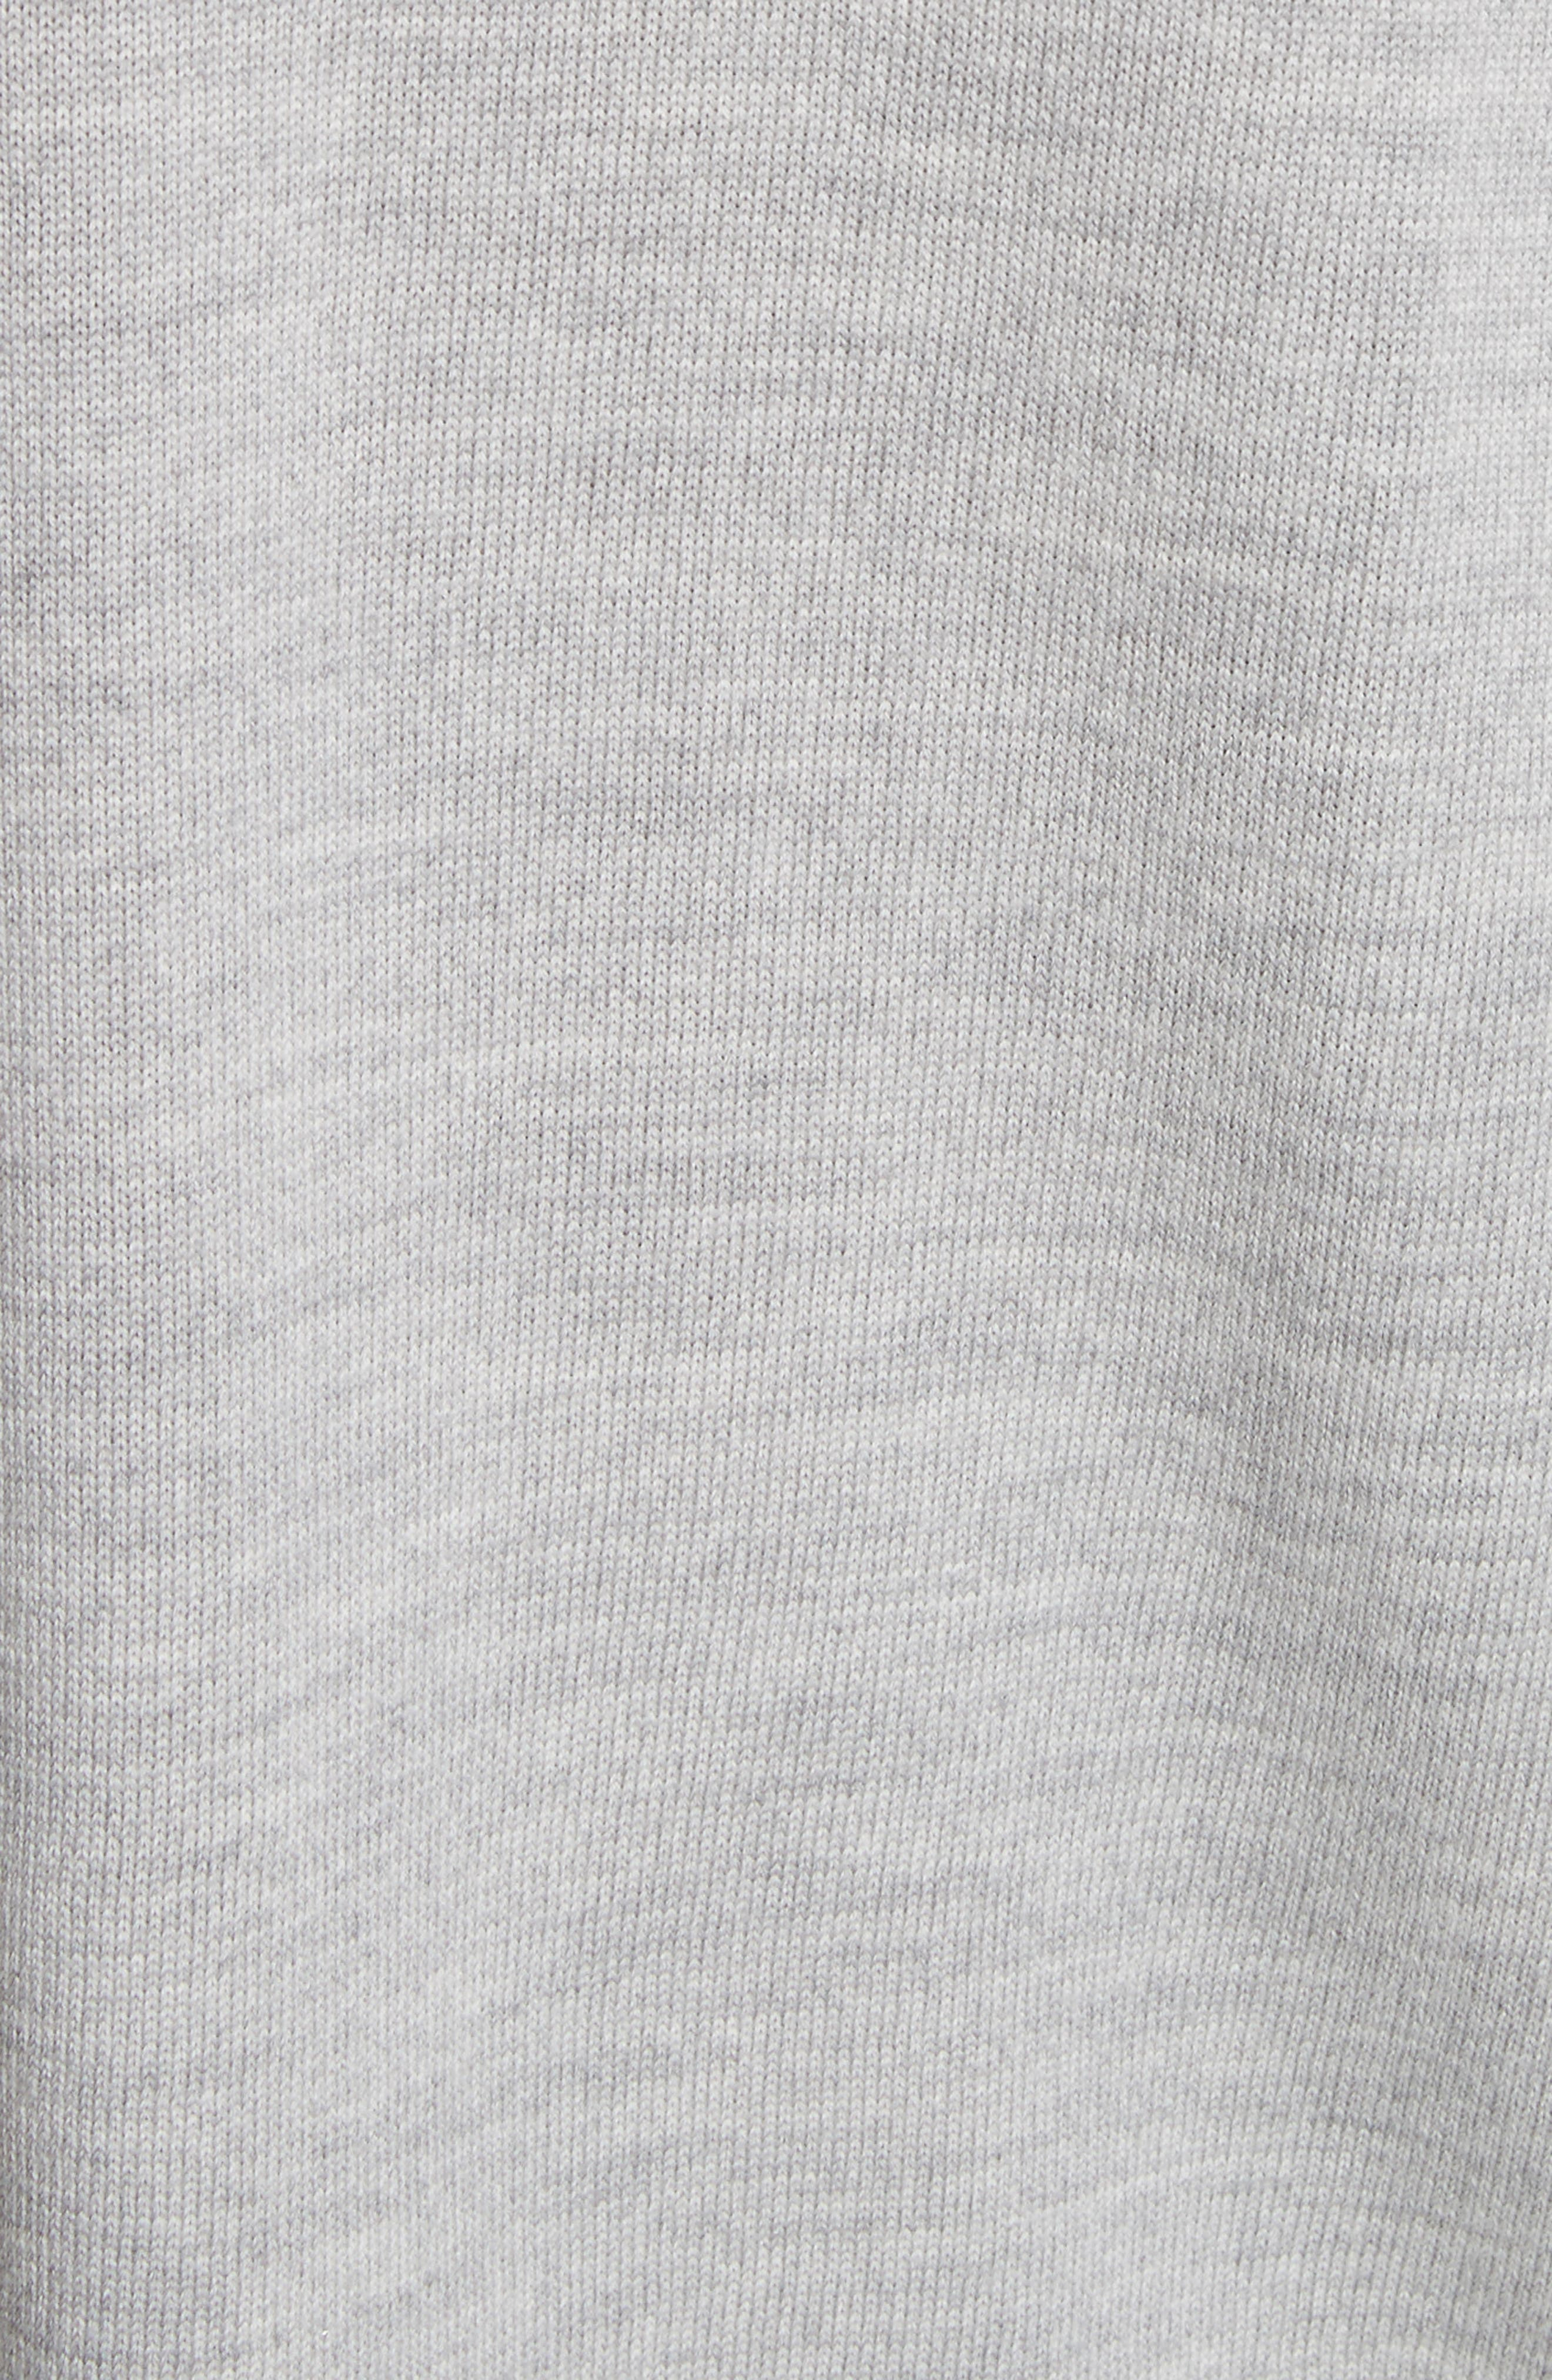 Layered Hem Wool Sweater,                             Alternate thumbnail 5, color,                             050